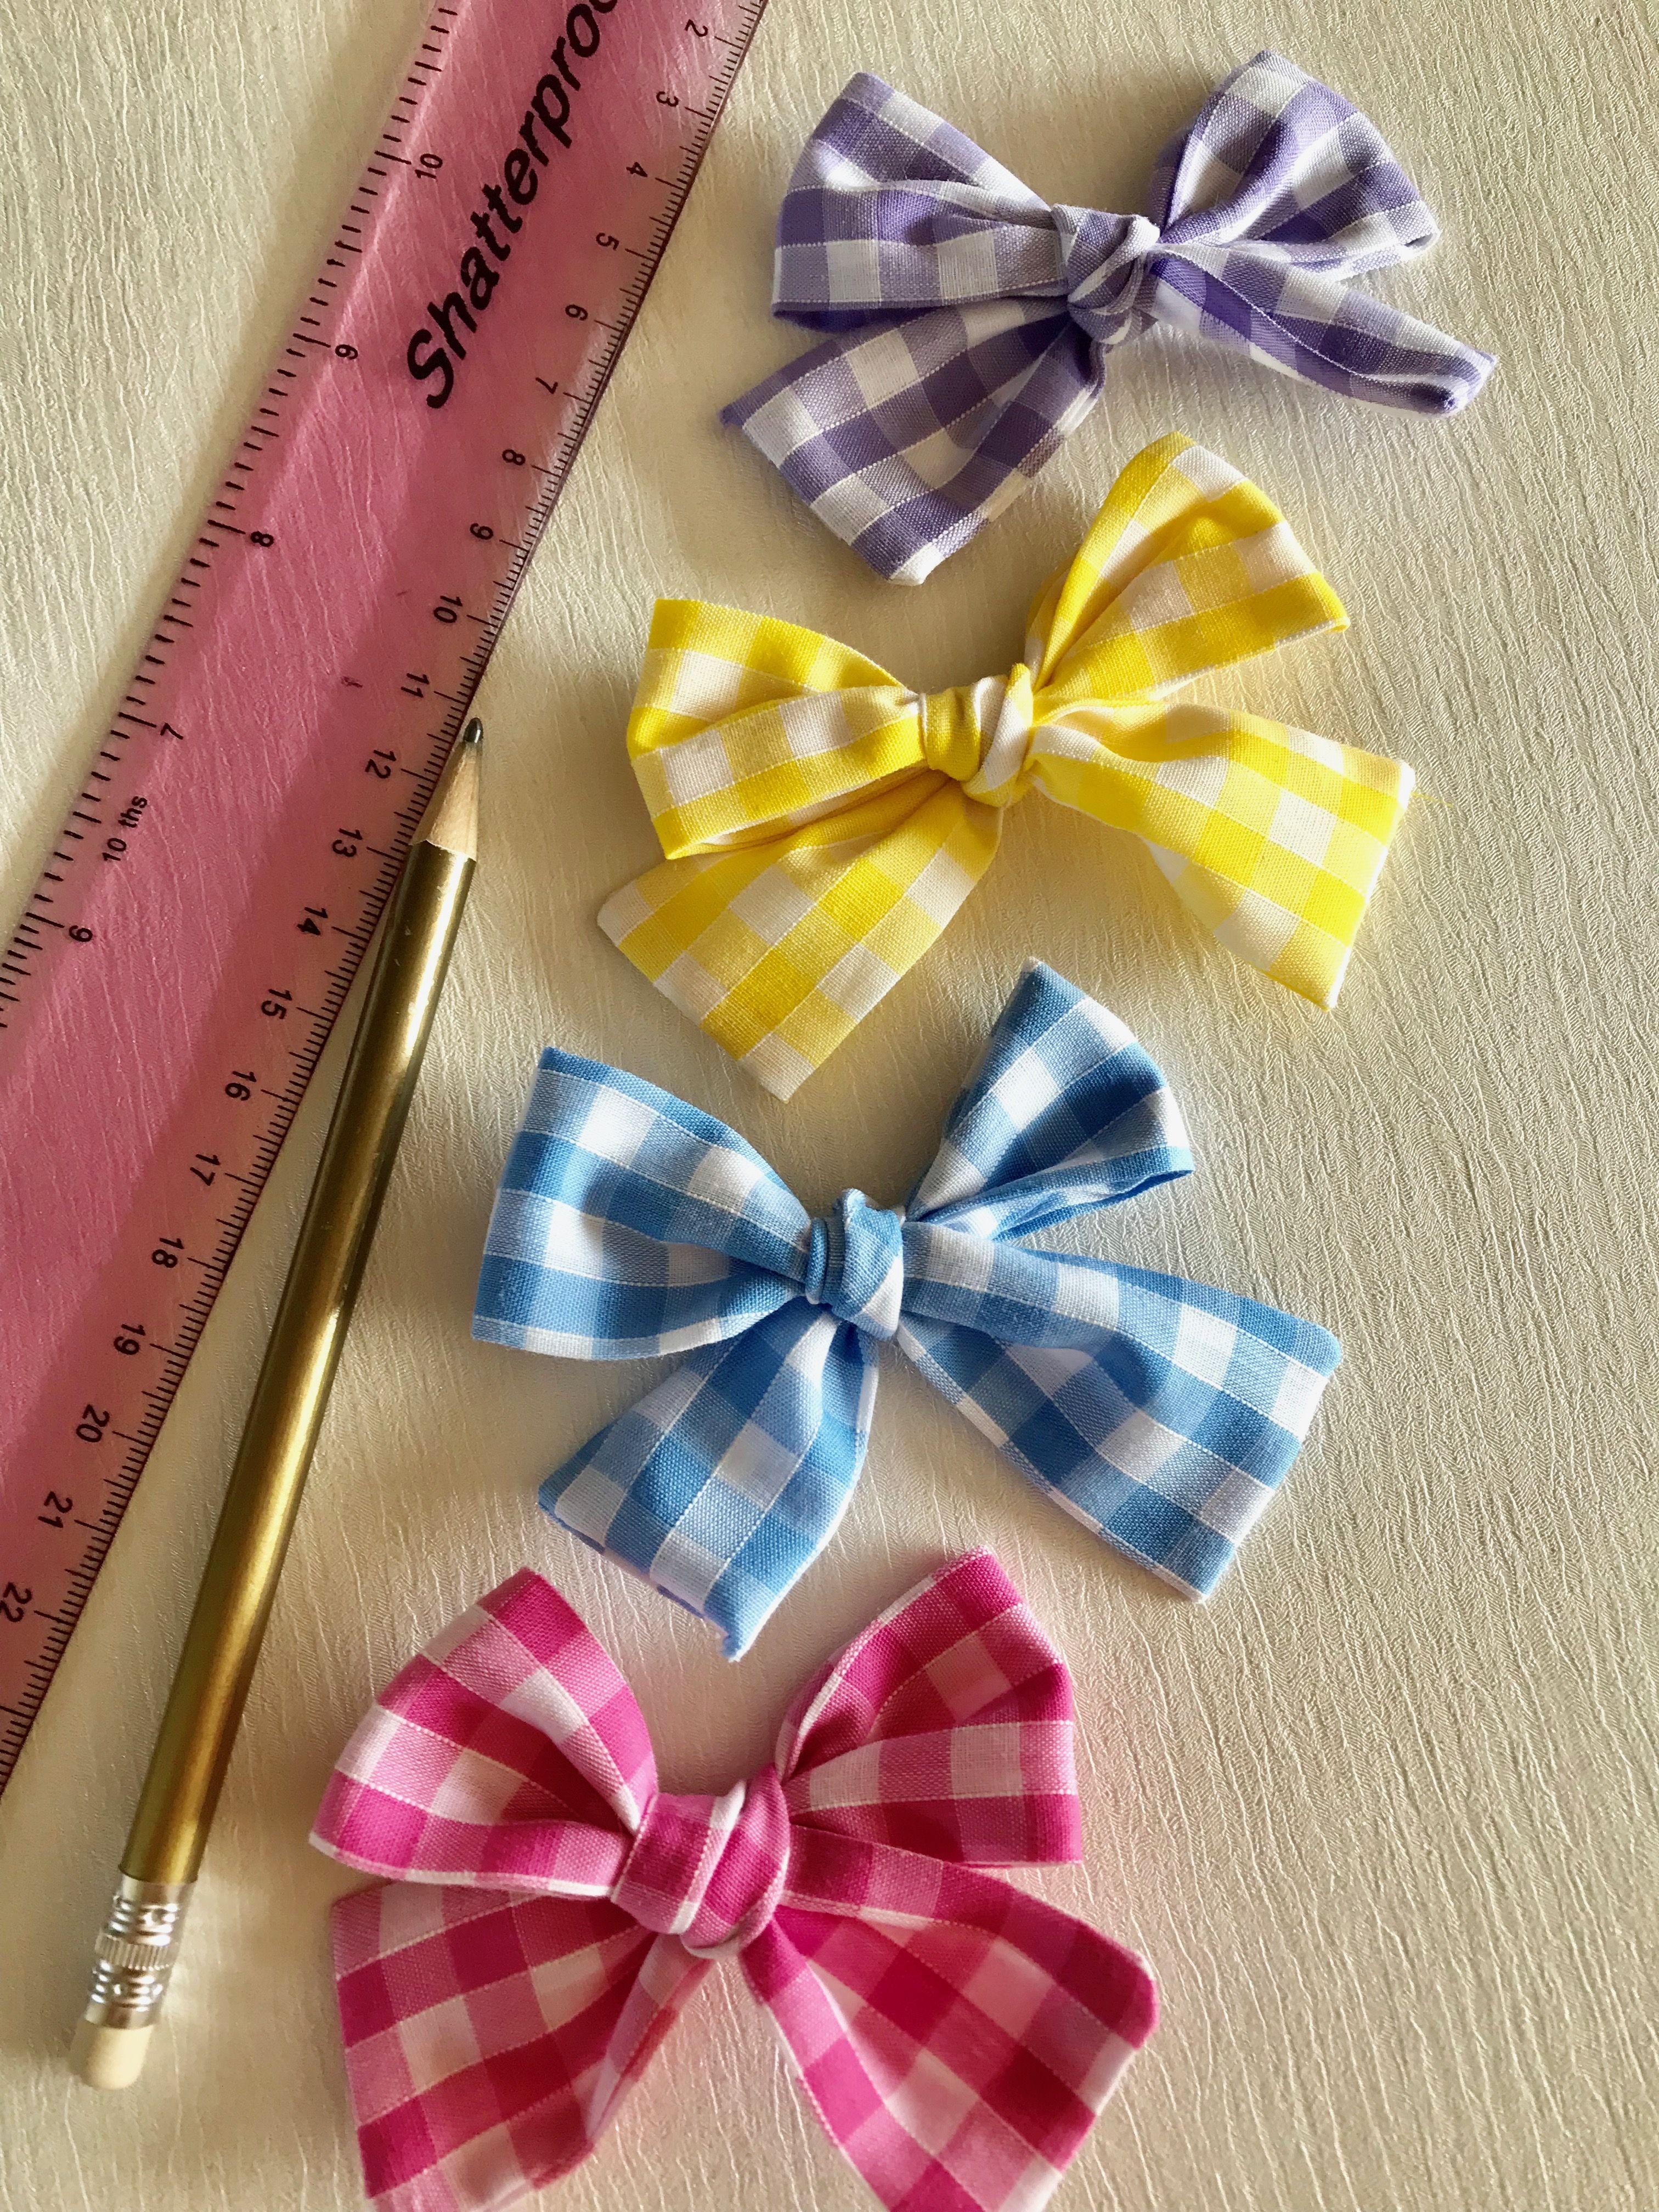 8cf7da6b9877 Gingham Plaid Hair Bows - handmade knitted hair bows. Available on one soft  headband or